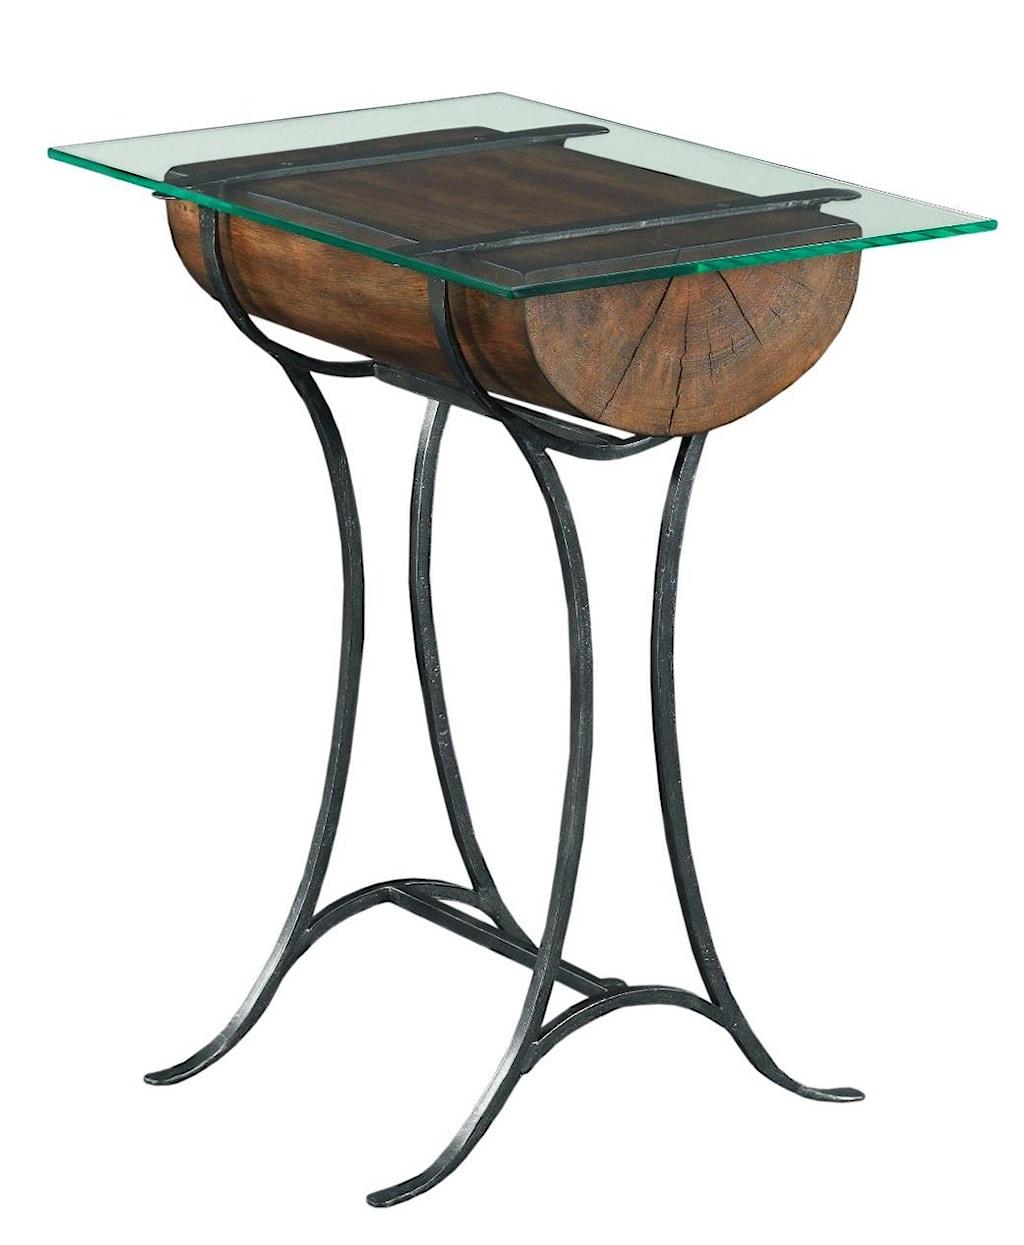 Kincaid Furniture Modern Classics Occasional Tables 69 1630 Rustic